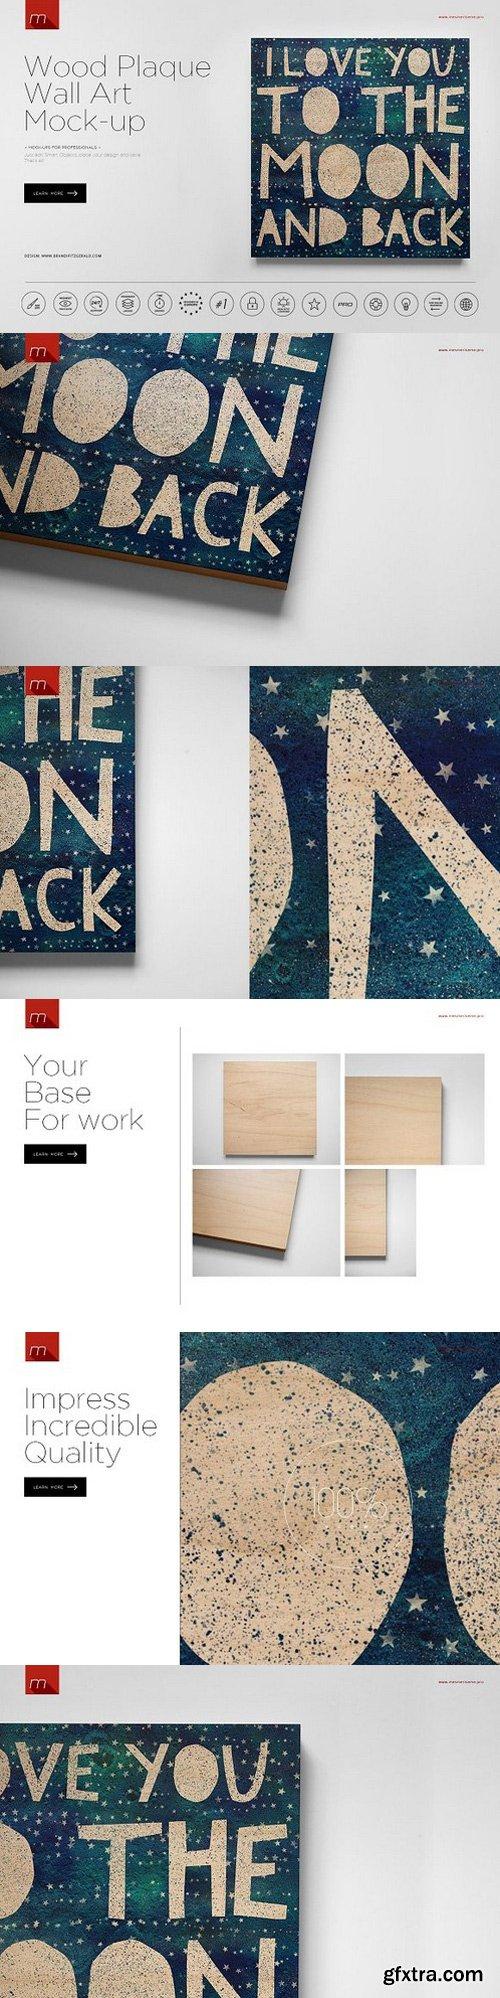 CM - Wood Plaque Wall Art Mock-up 1057206